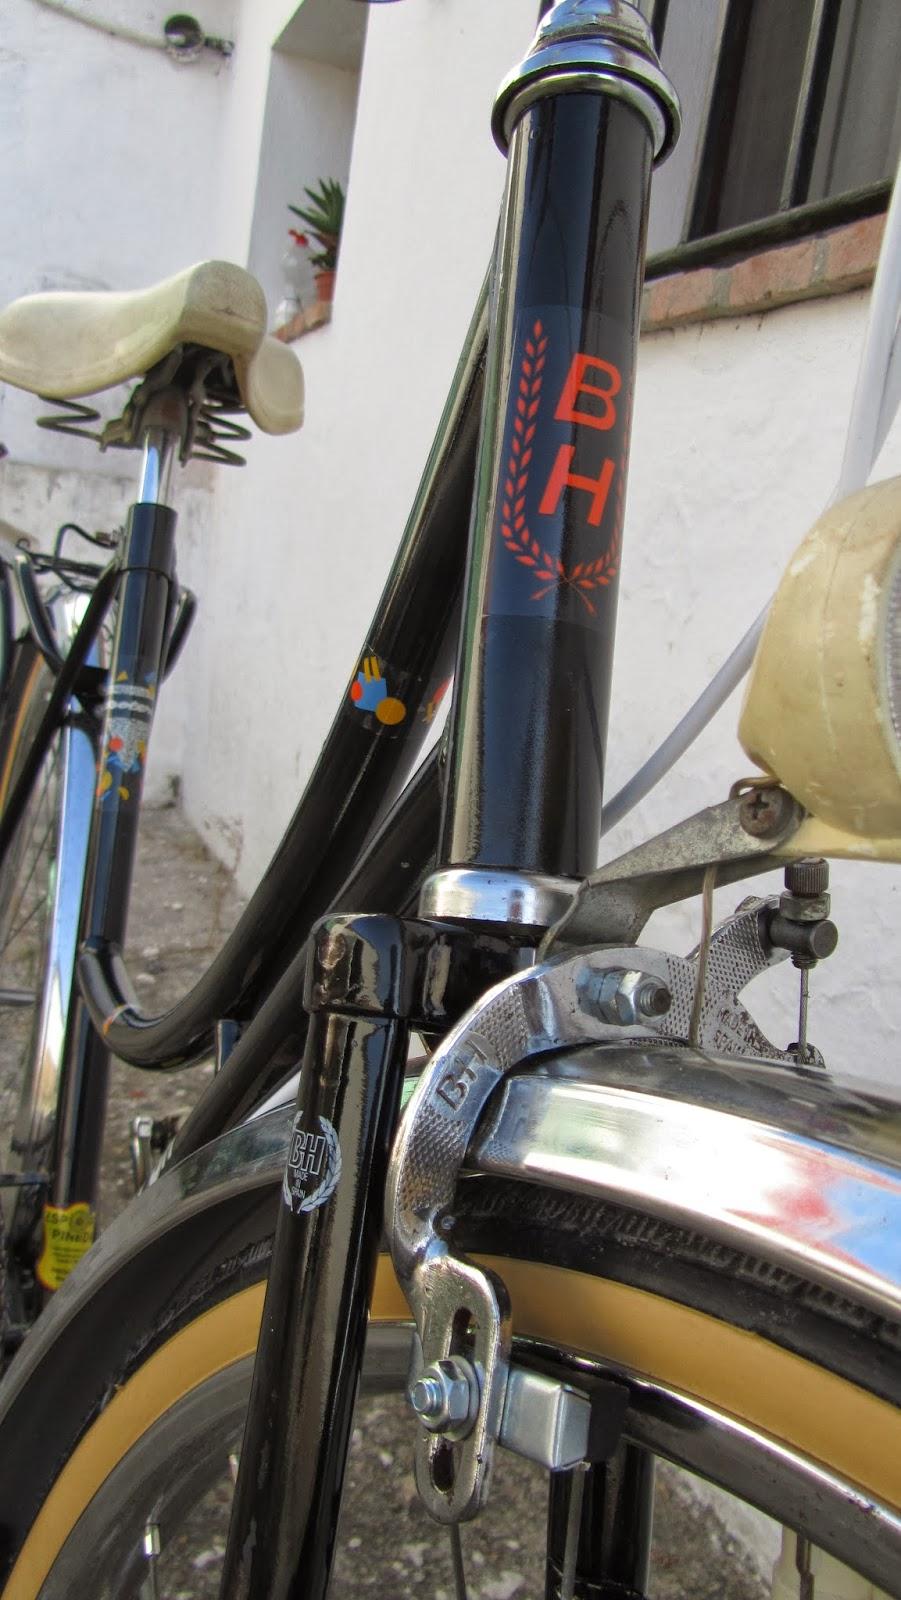 Bicicleta clásica - Bh Bolero